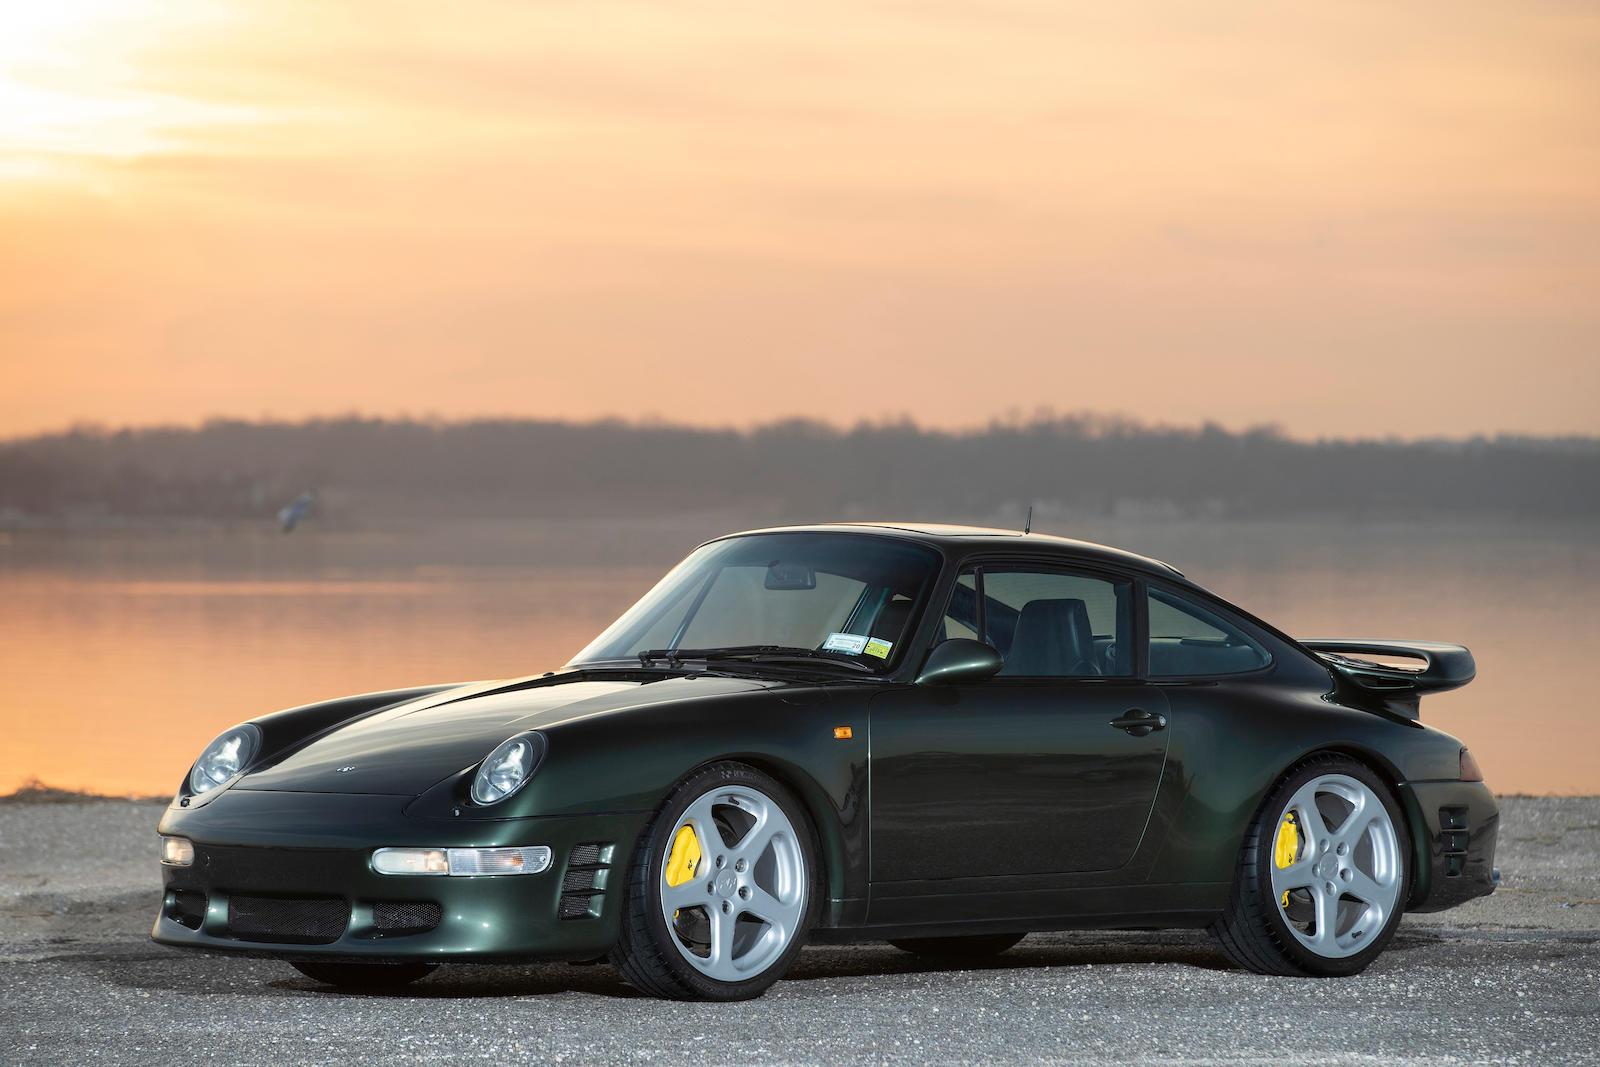 1998 RUF 911 Turbo R